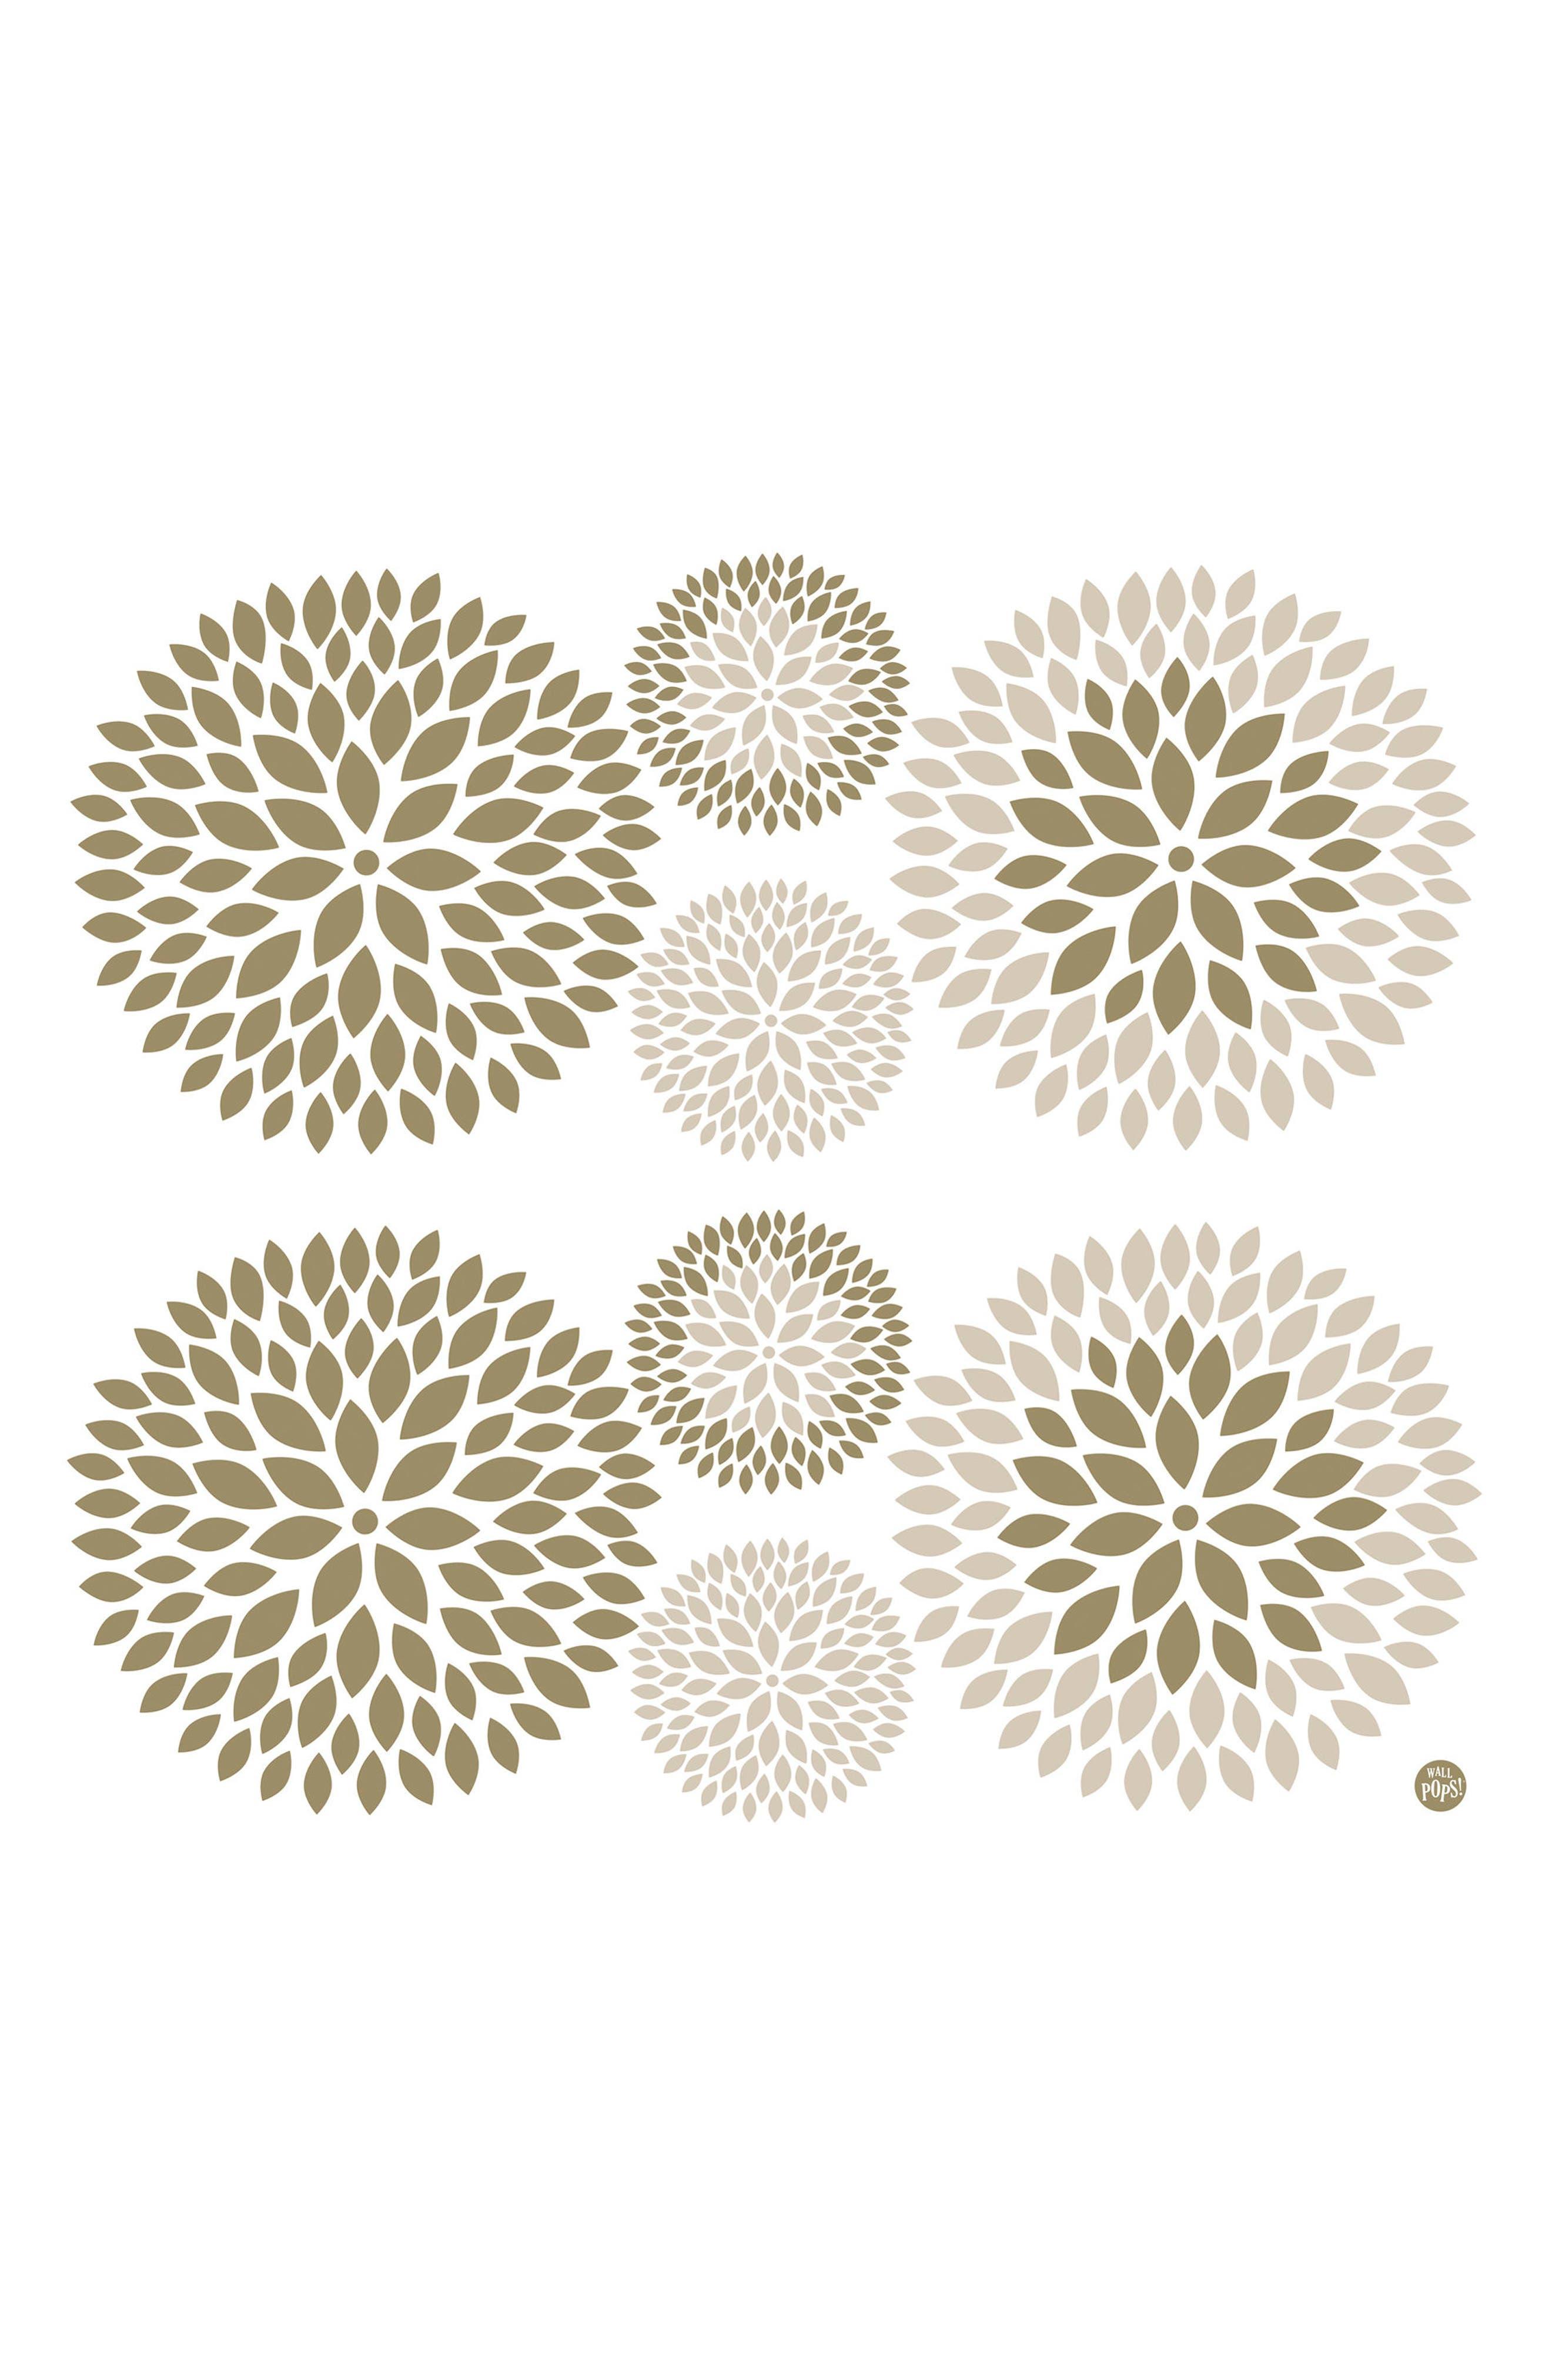 Main Image - Wallpops Chrysanthemum 8-Piece Wall Art Decal Set